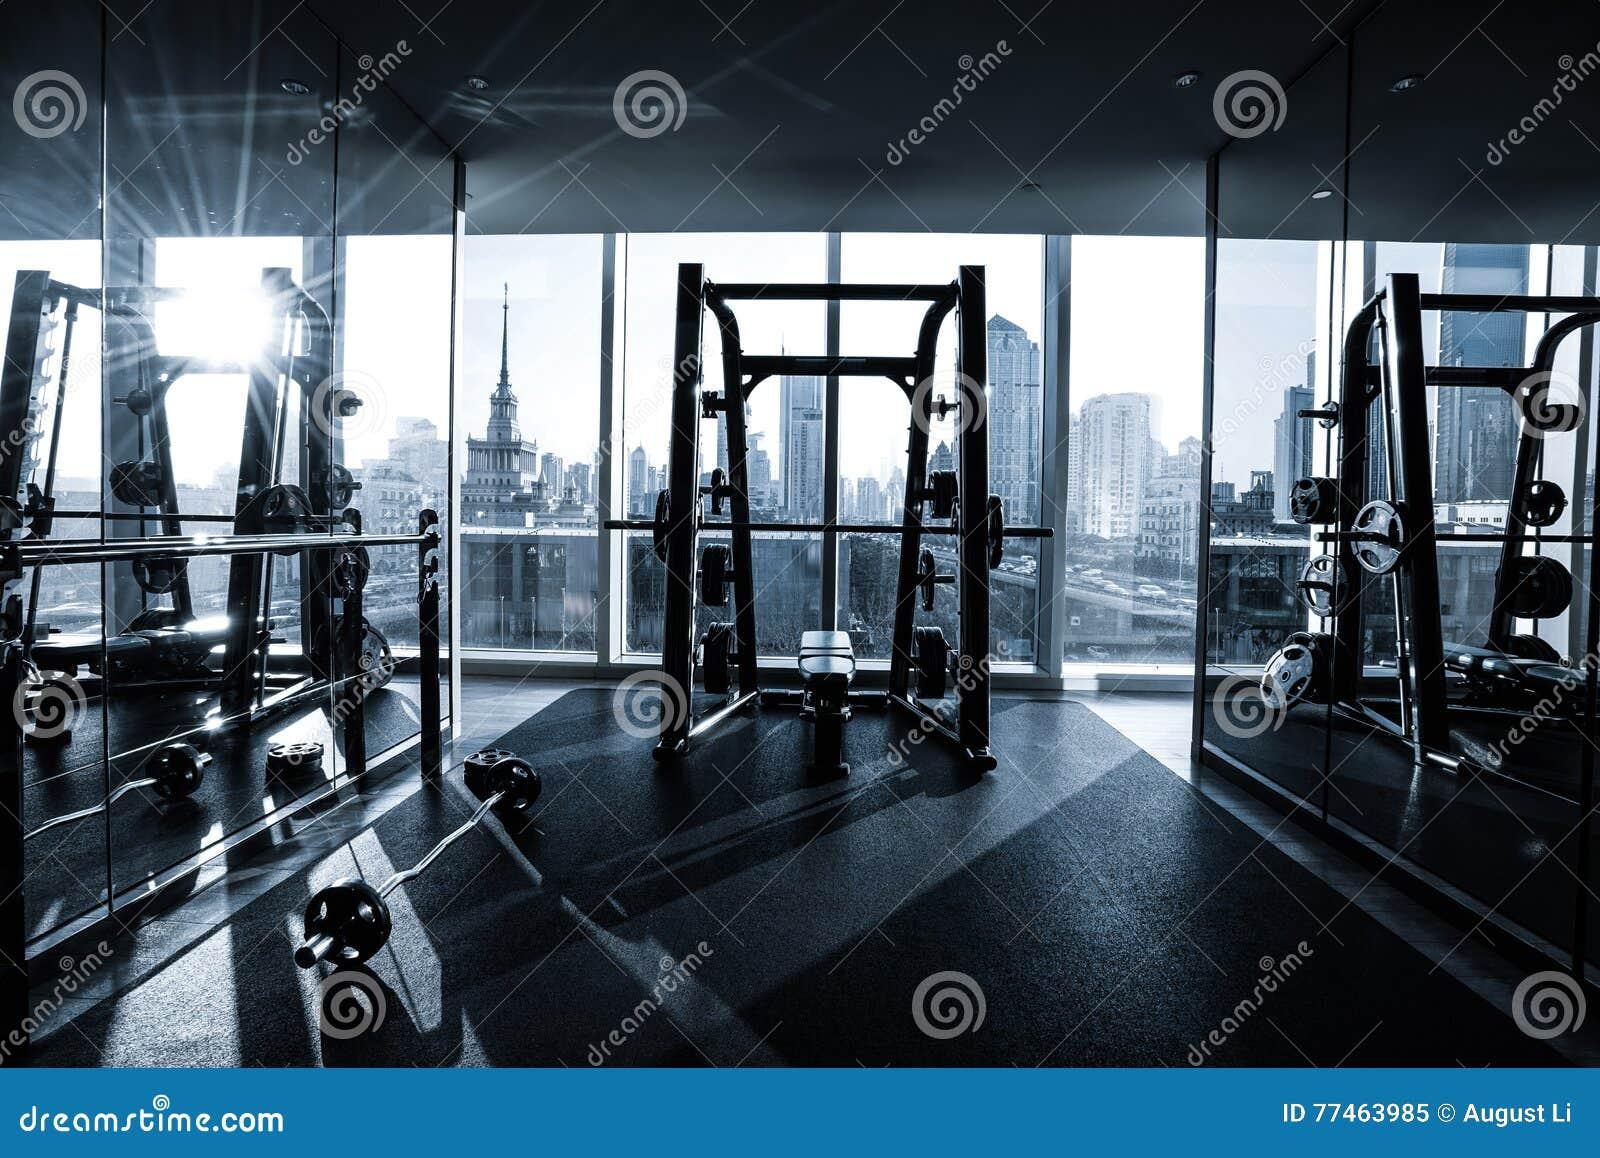 Admirable Fitness Club Interior Stock Image Image Of Kilogram 77463985 Interior Design Ideas Skatsoteloinfo